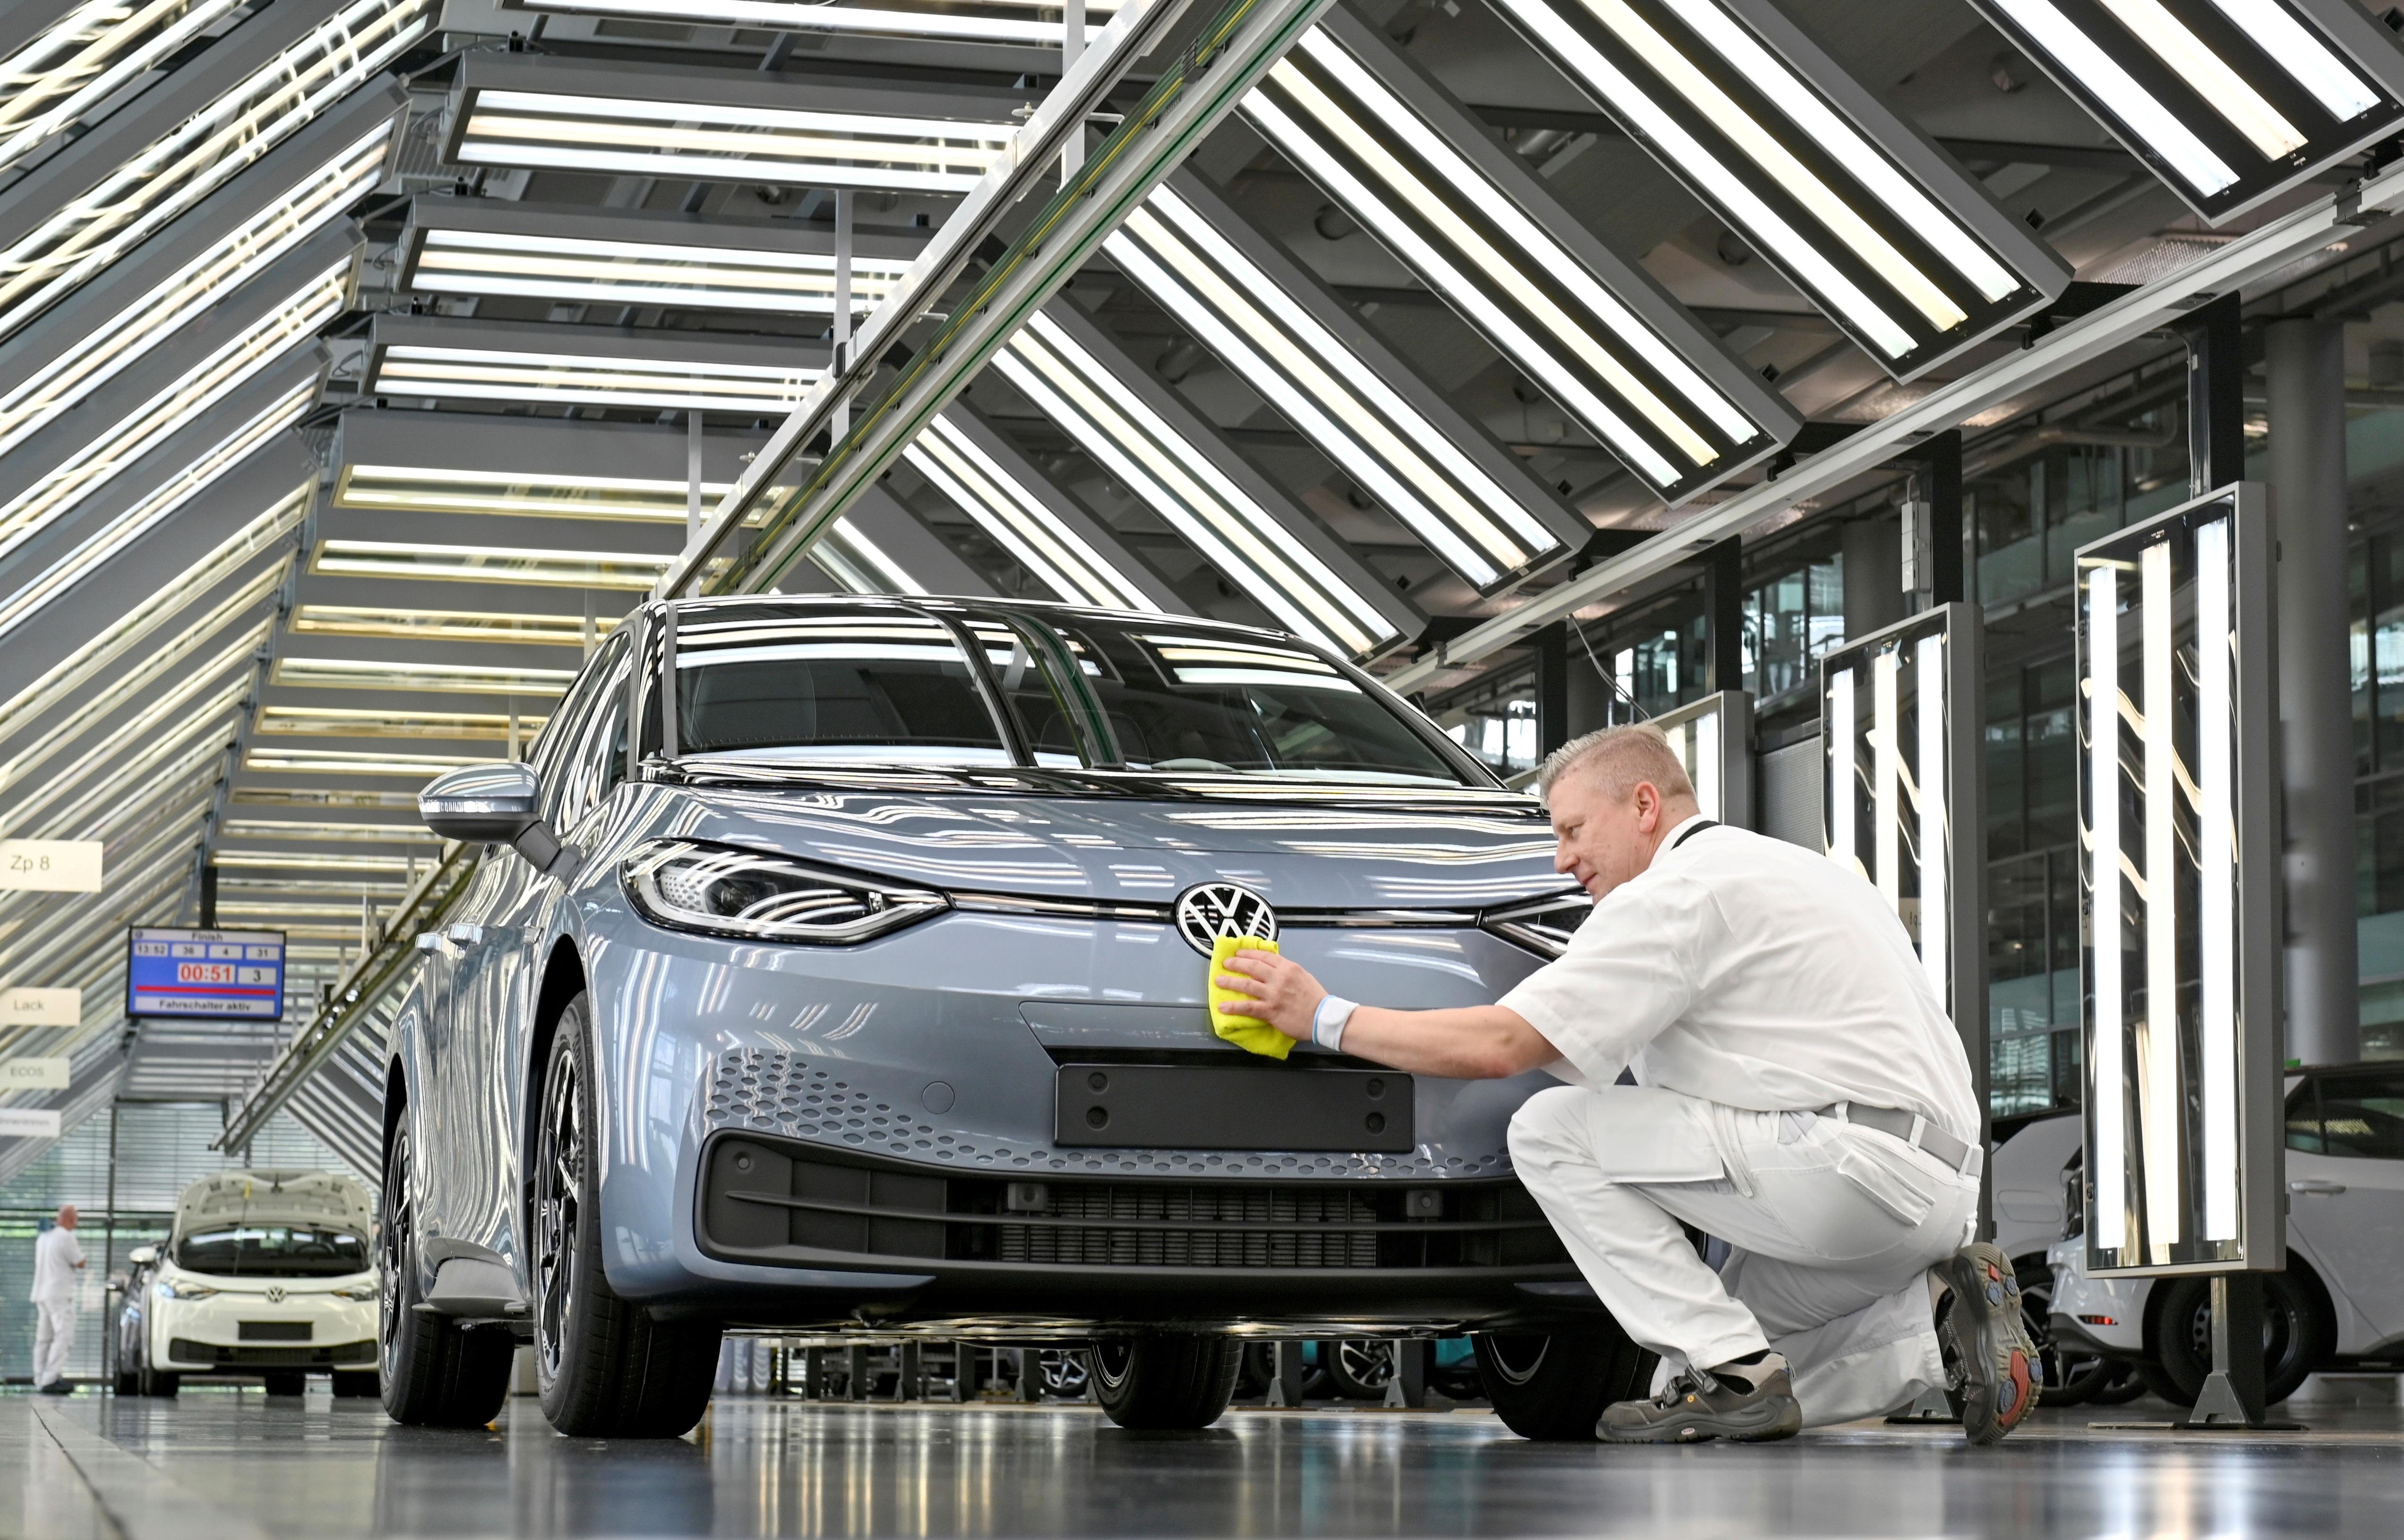 Technicians work in the final inspection line of German carmaker Volkswagen's electric ID. 3 car in Dresden, Germany, June 8, 2021. REUTERS/Matthias Rietschel/File Photo